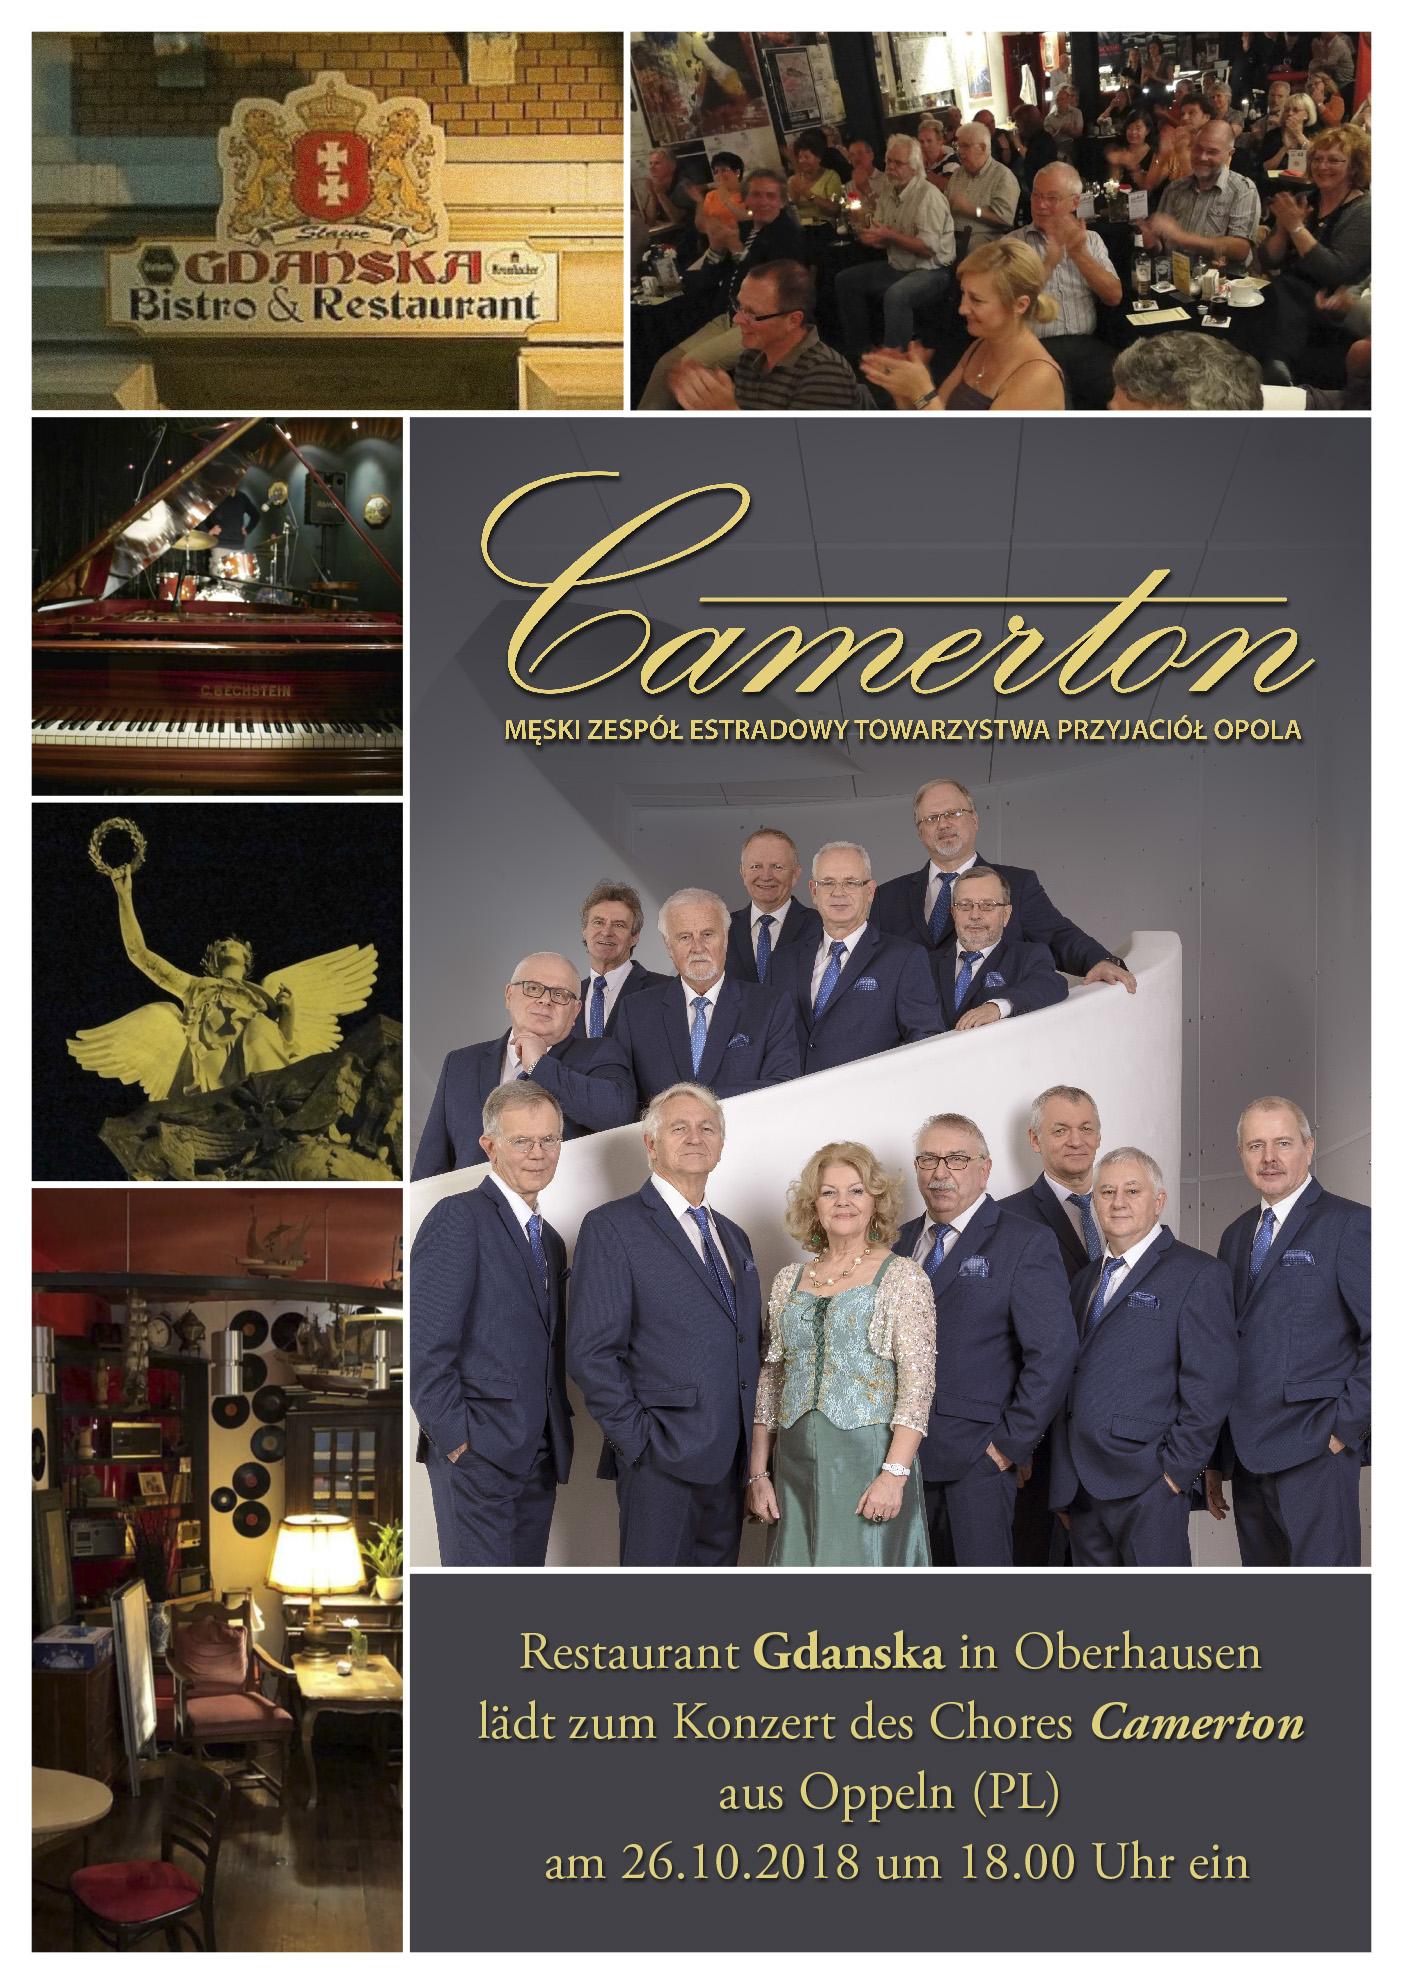 http://www.gdanska.de/wp-content/uploads/2018/10/Gdanska-koncert-Plakat-Format-JPG.jpg